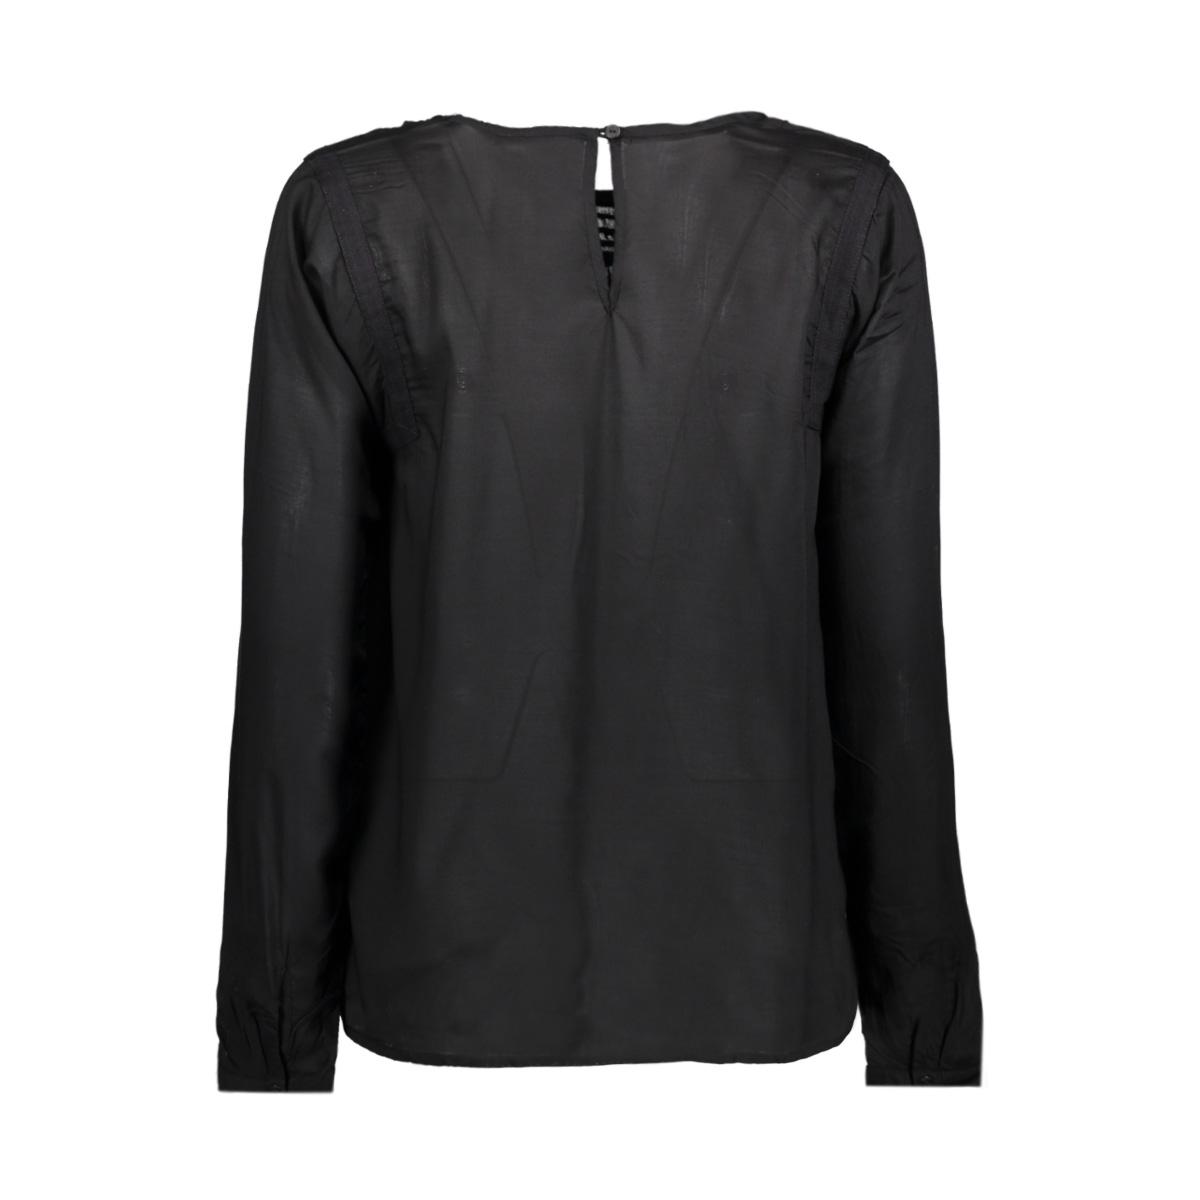 h70235 garcia blouse 60 black